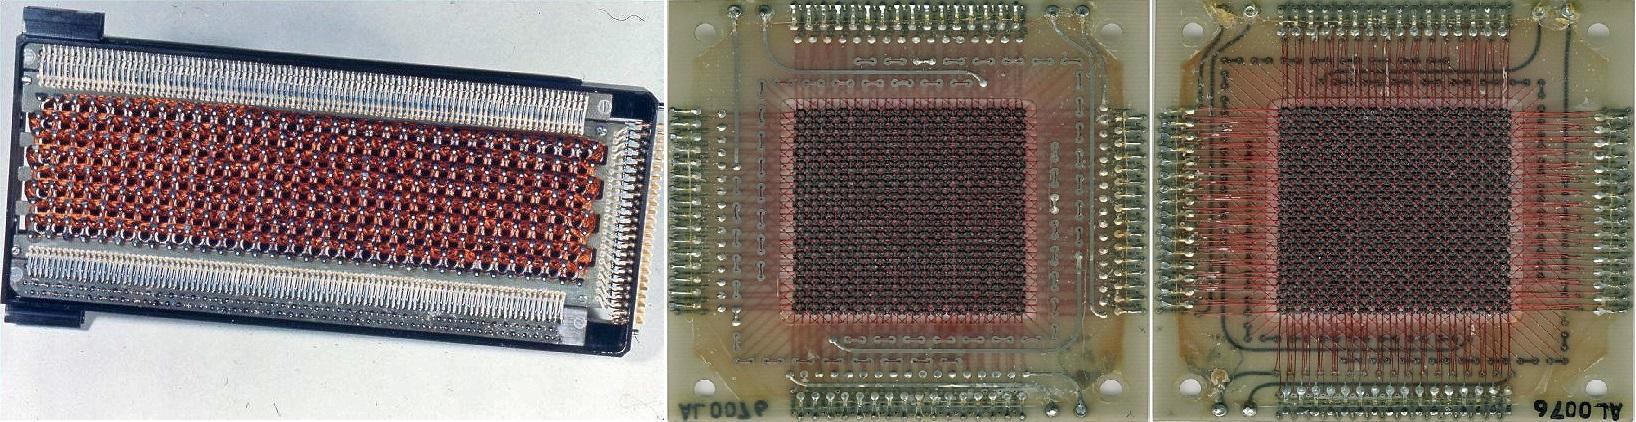 5c80164a65aa43fc86afb946b74aa57d.jpg